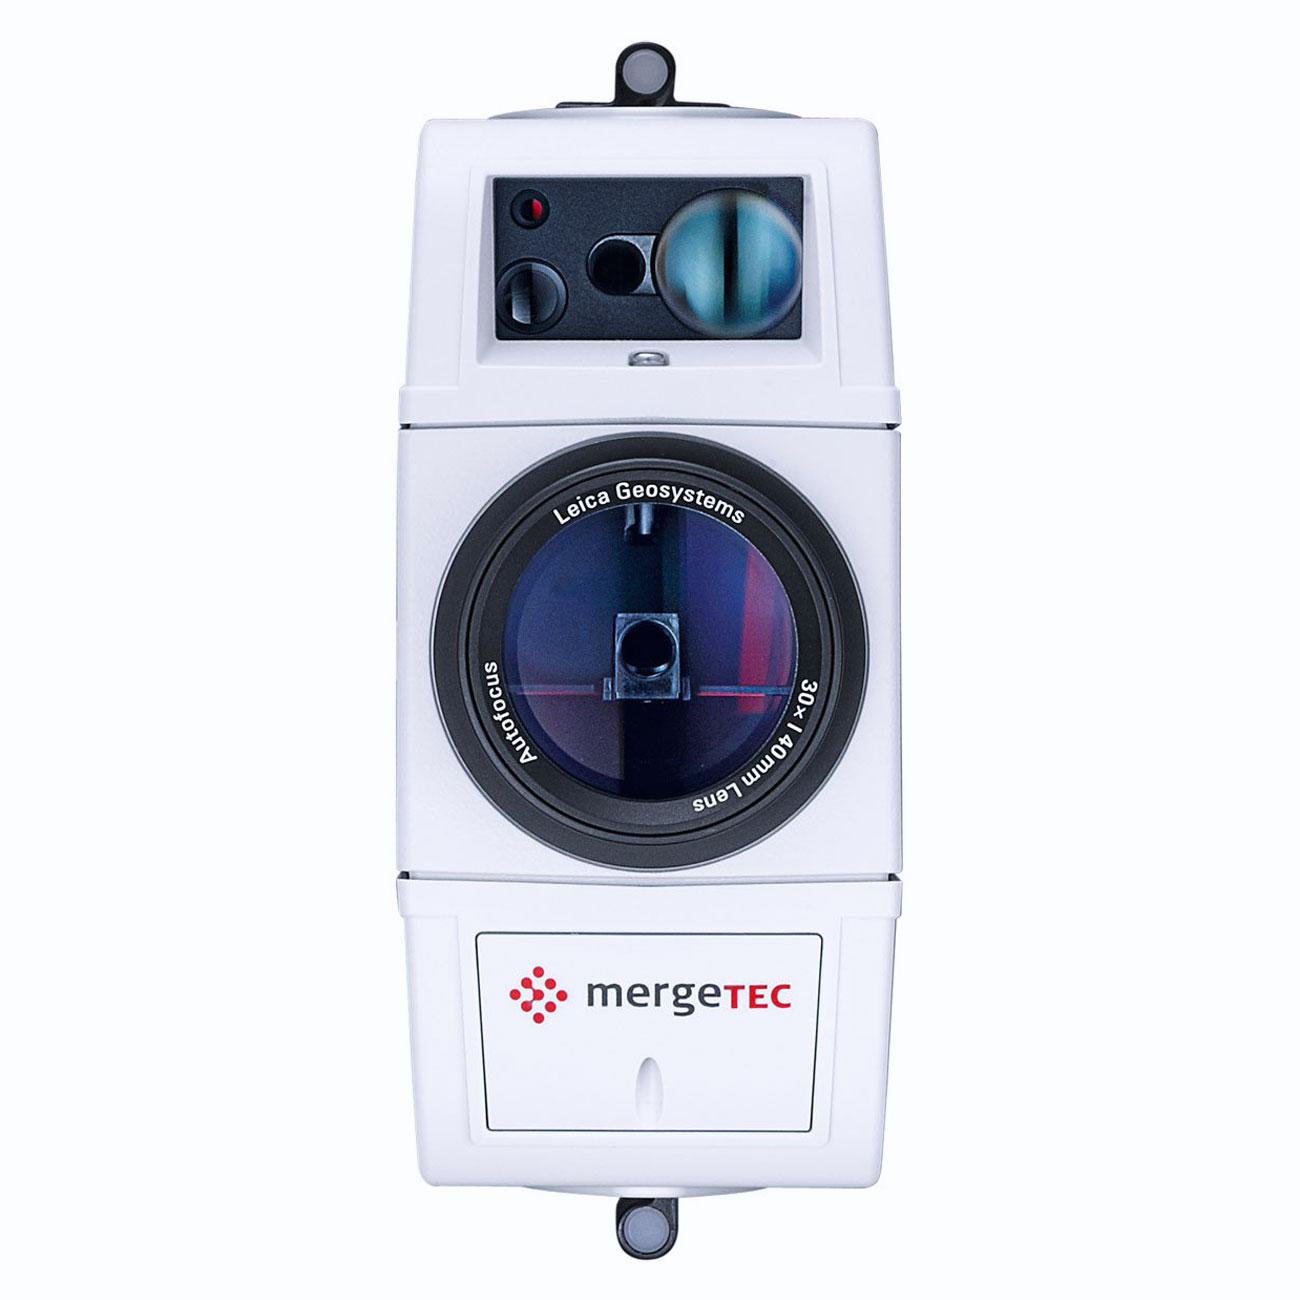 Leica-MS60-1-Sale.jpg